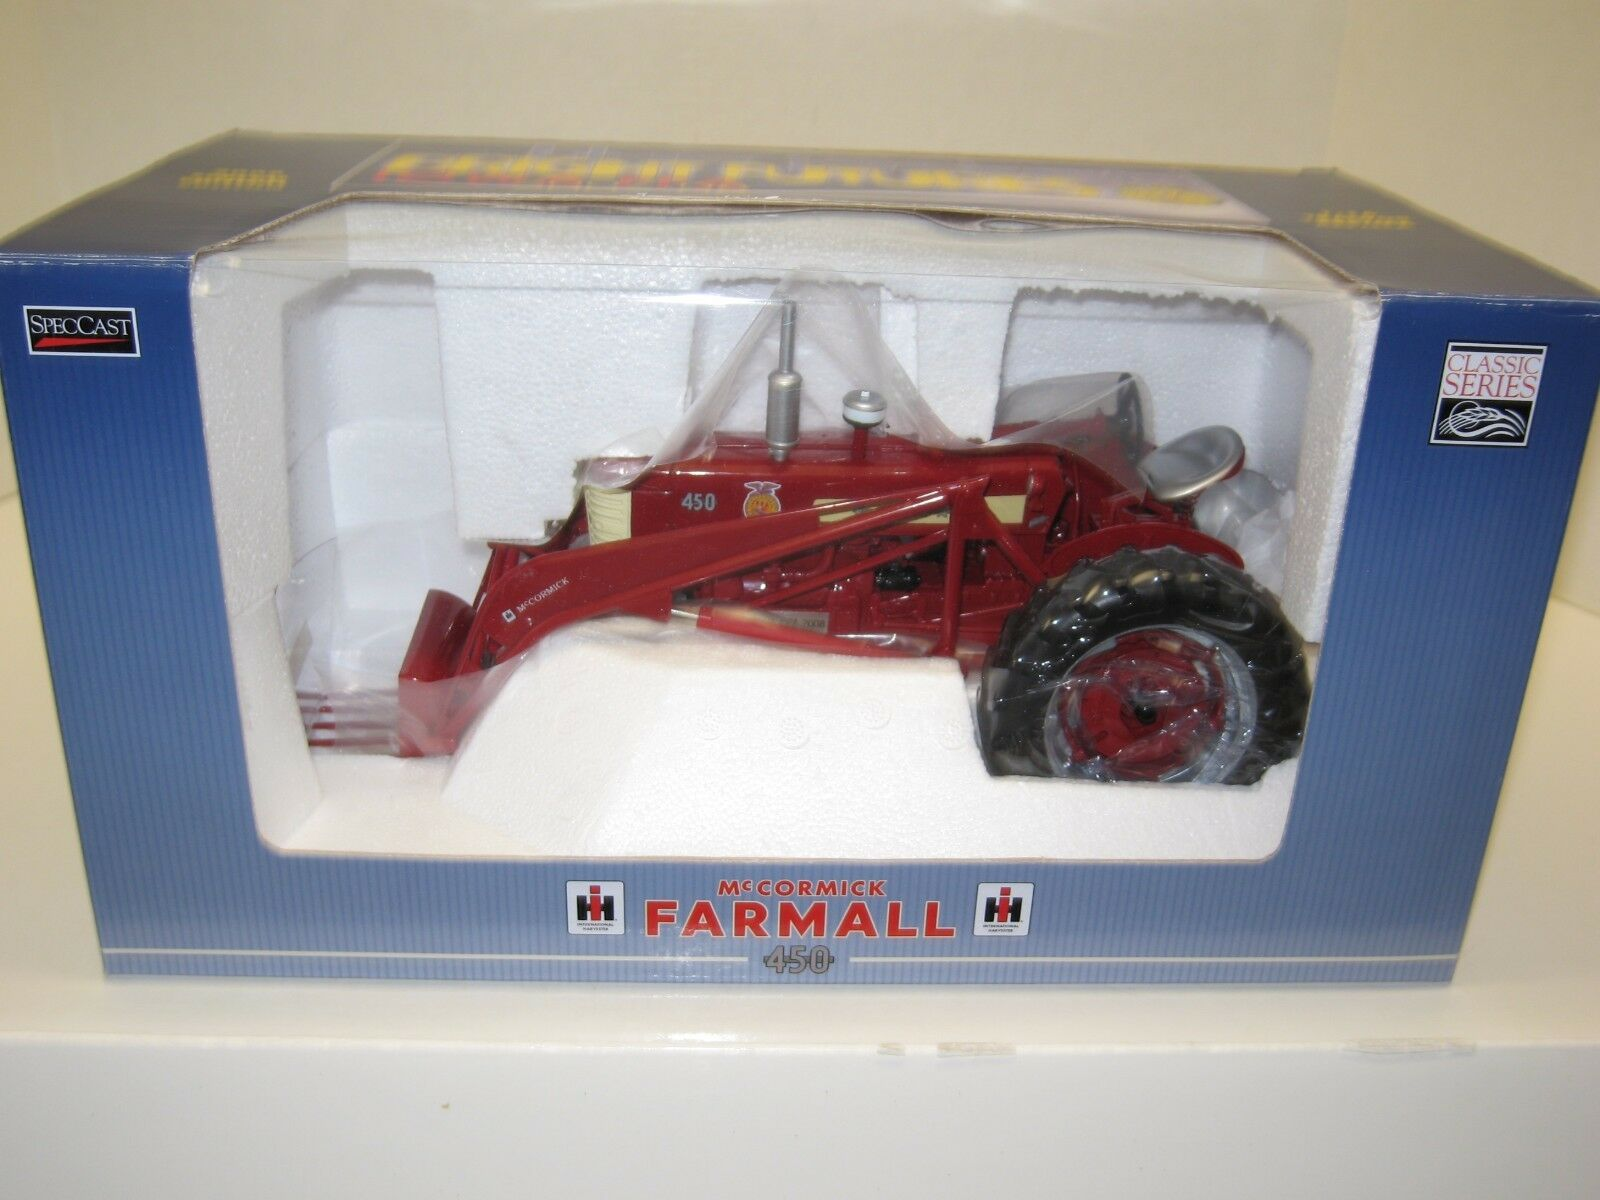 1 16 FARMALL FARMALL FARMALL 450 w A LOADER, IOWA FFA EDITION NIB free shipping b04678